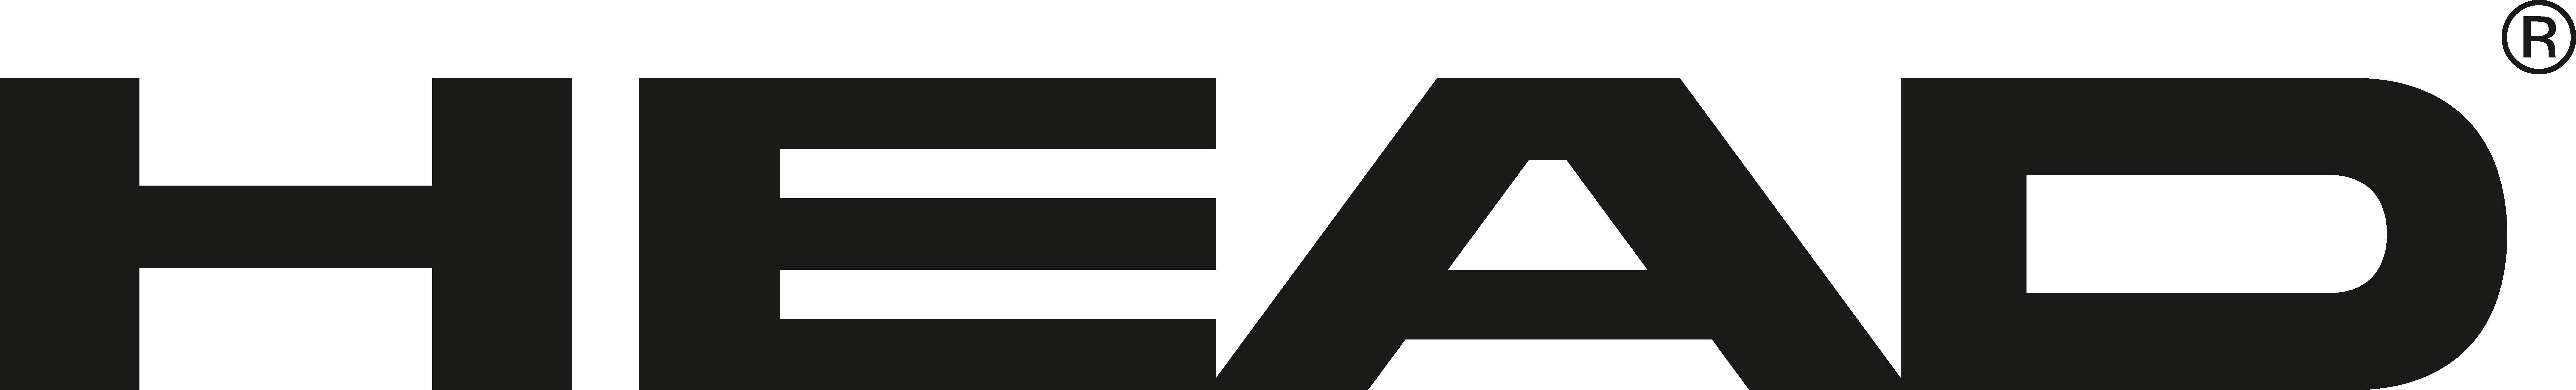 logo head allauch club